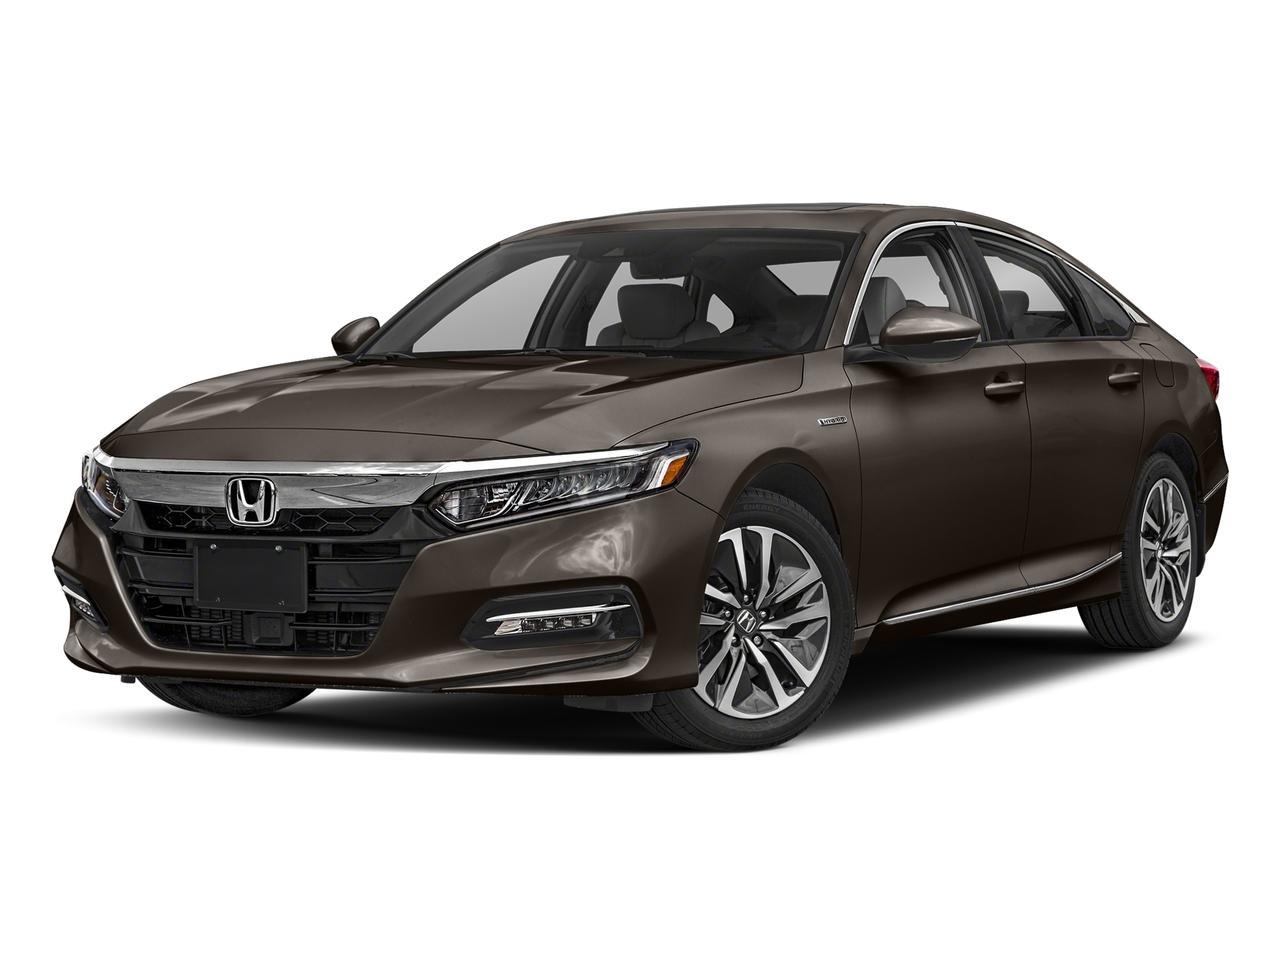 2018 Honda Accord Hybrid Vehicle Photo in San Antonio, TX 78238